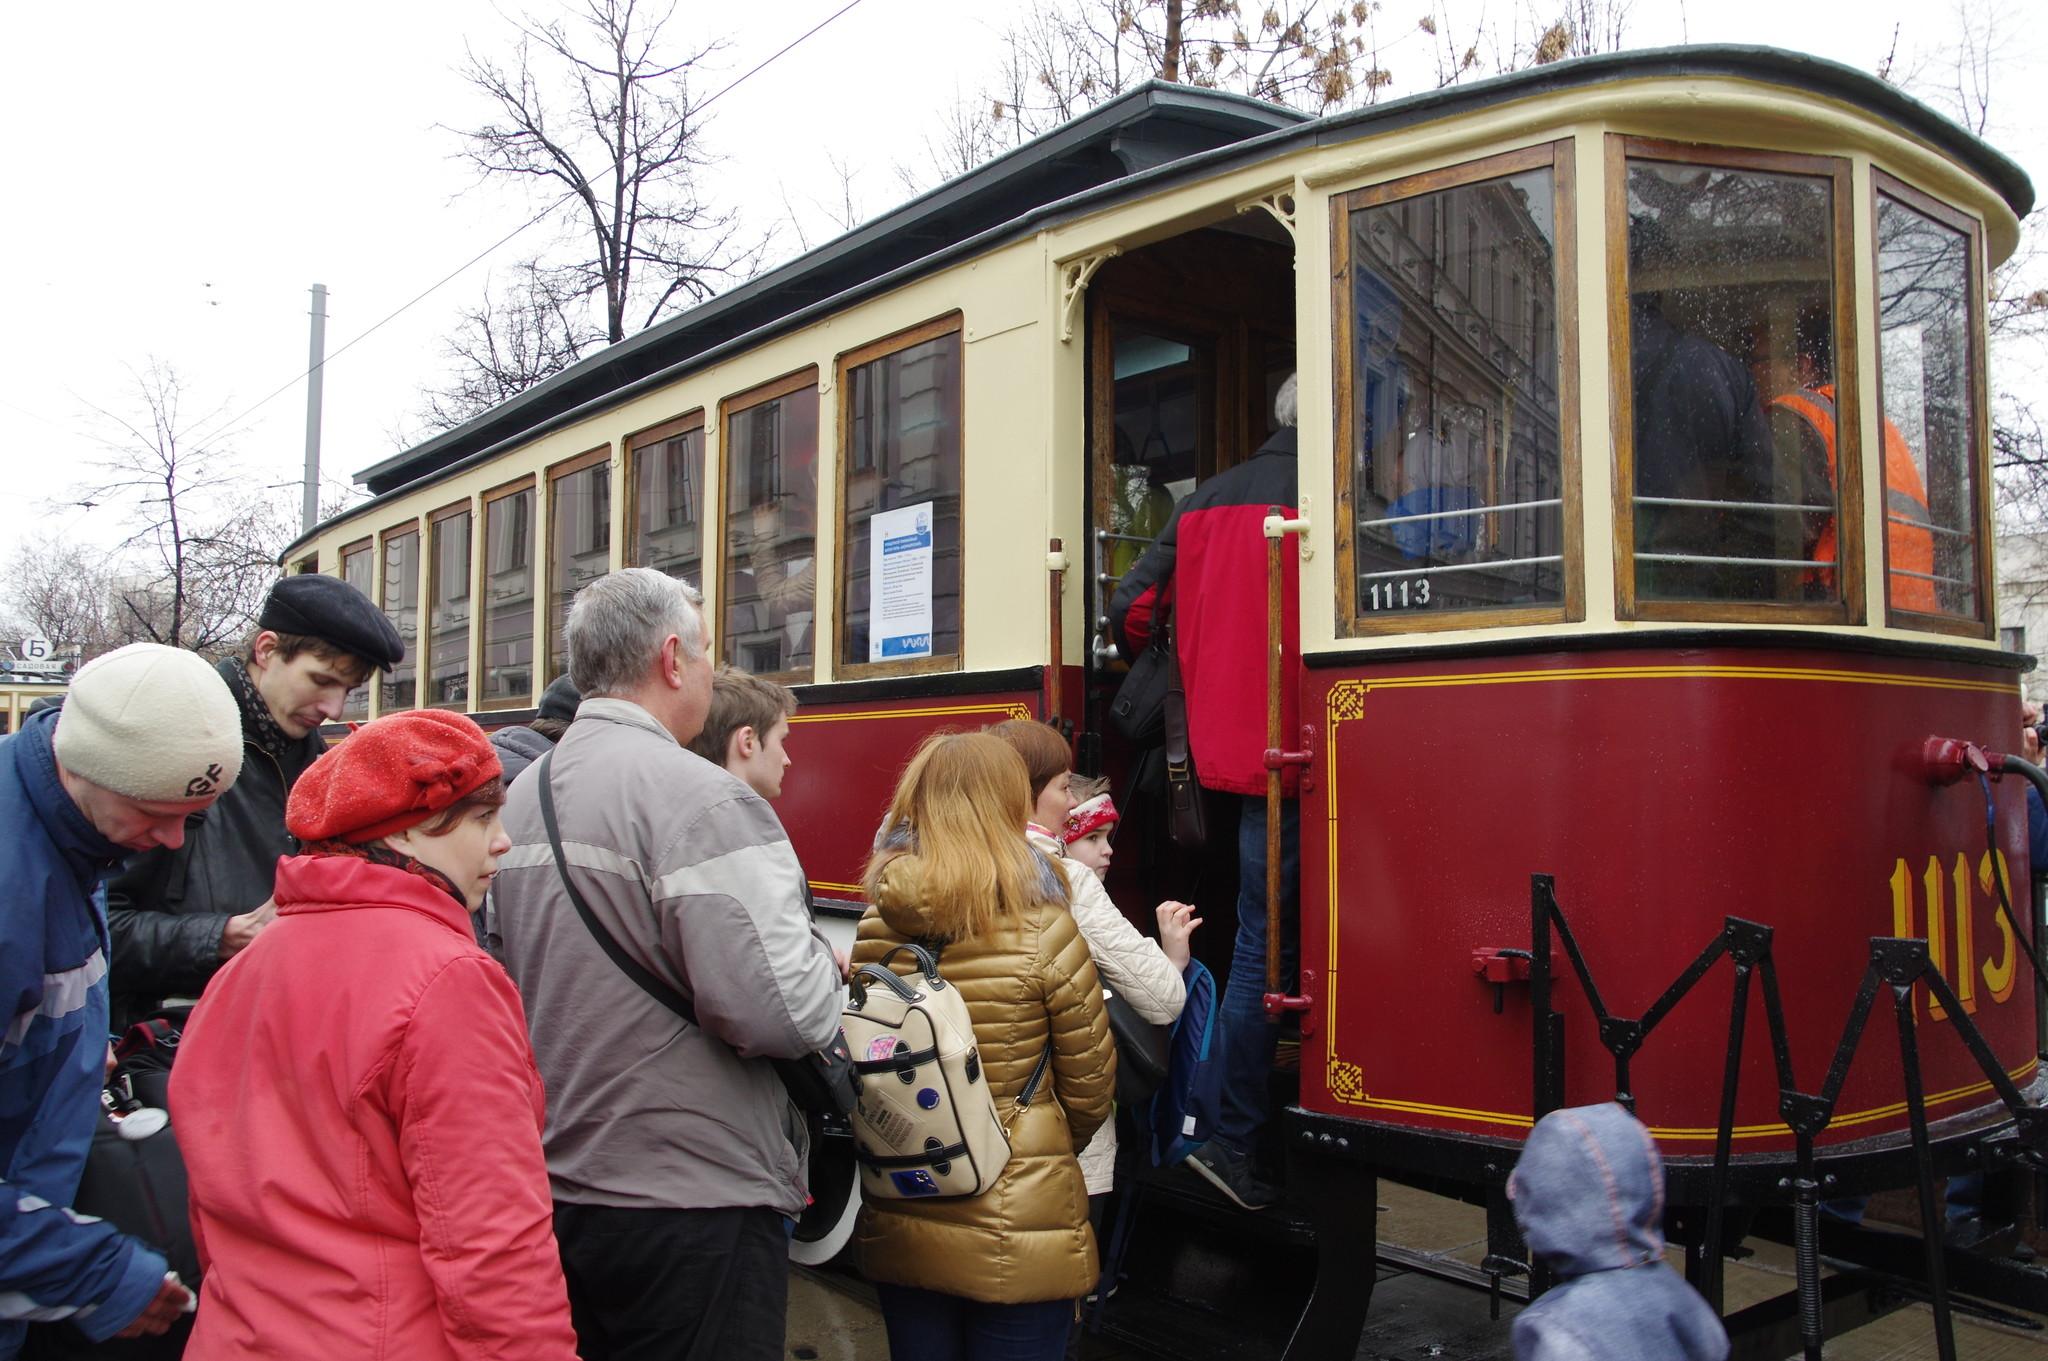 Прицепной трамвайный вагон типа «Н» («Нюрнбергский») на Чистопрудном бульваре